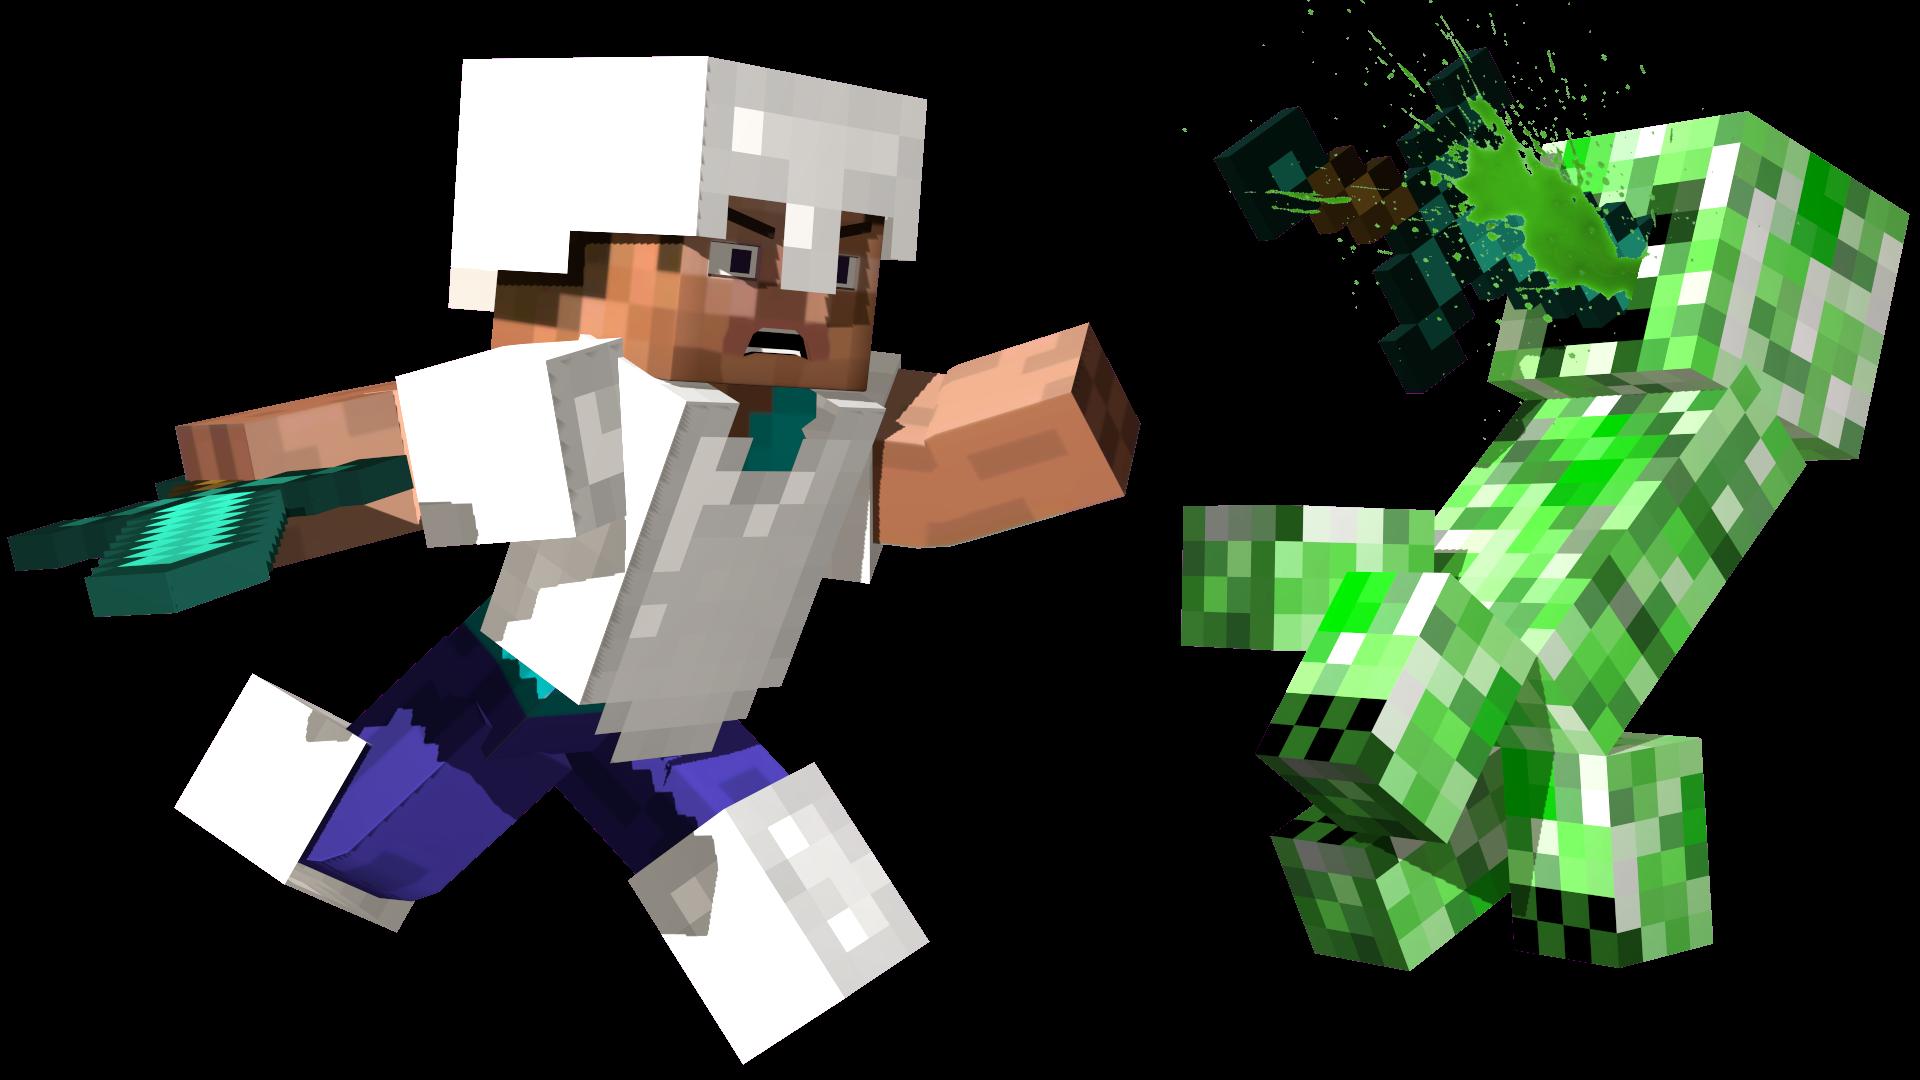 Steve vs the creeper by longsword97 on deviantart - Minecraft creeper and steve ...